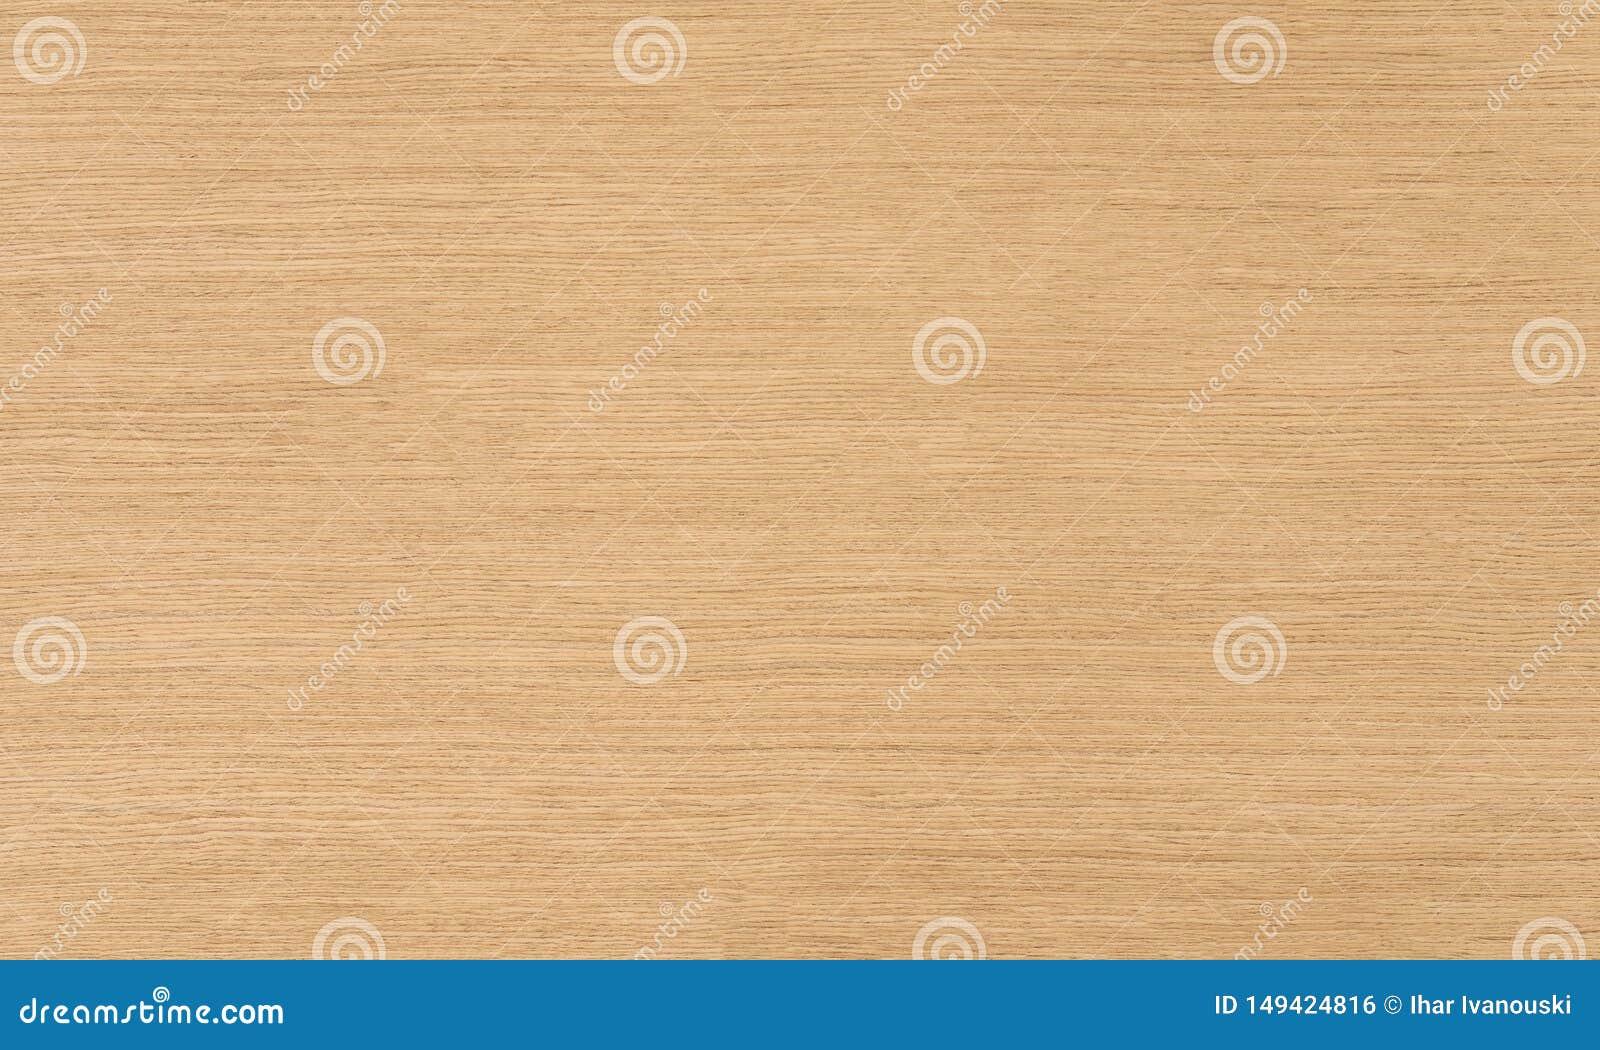 Decorative panel with imitation wood for finishing the kitchen